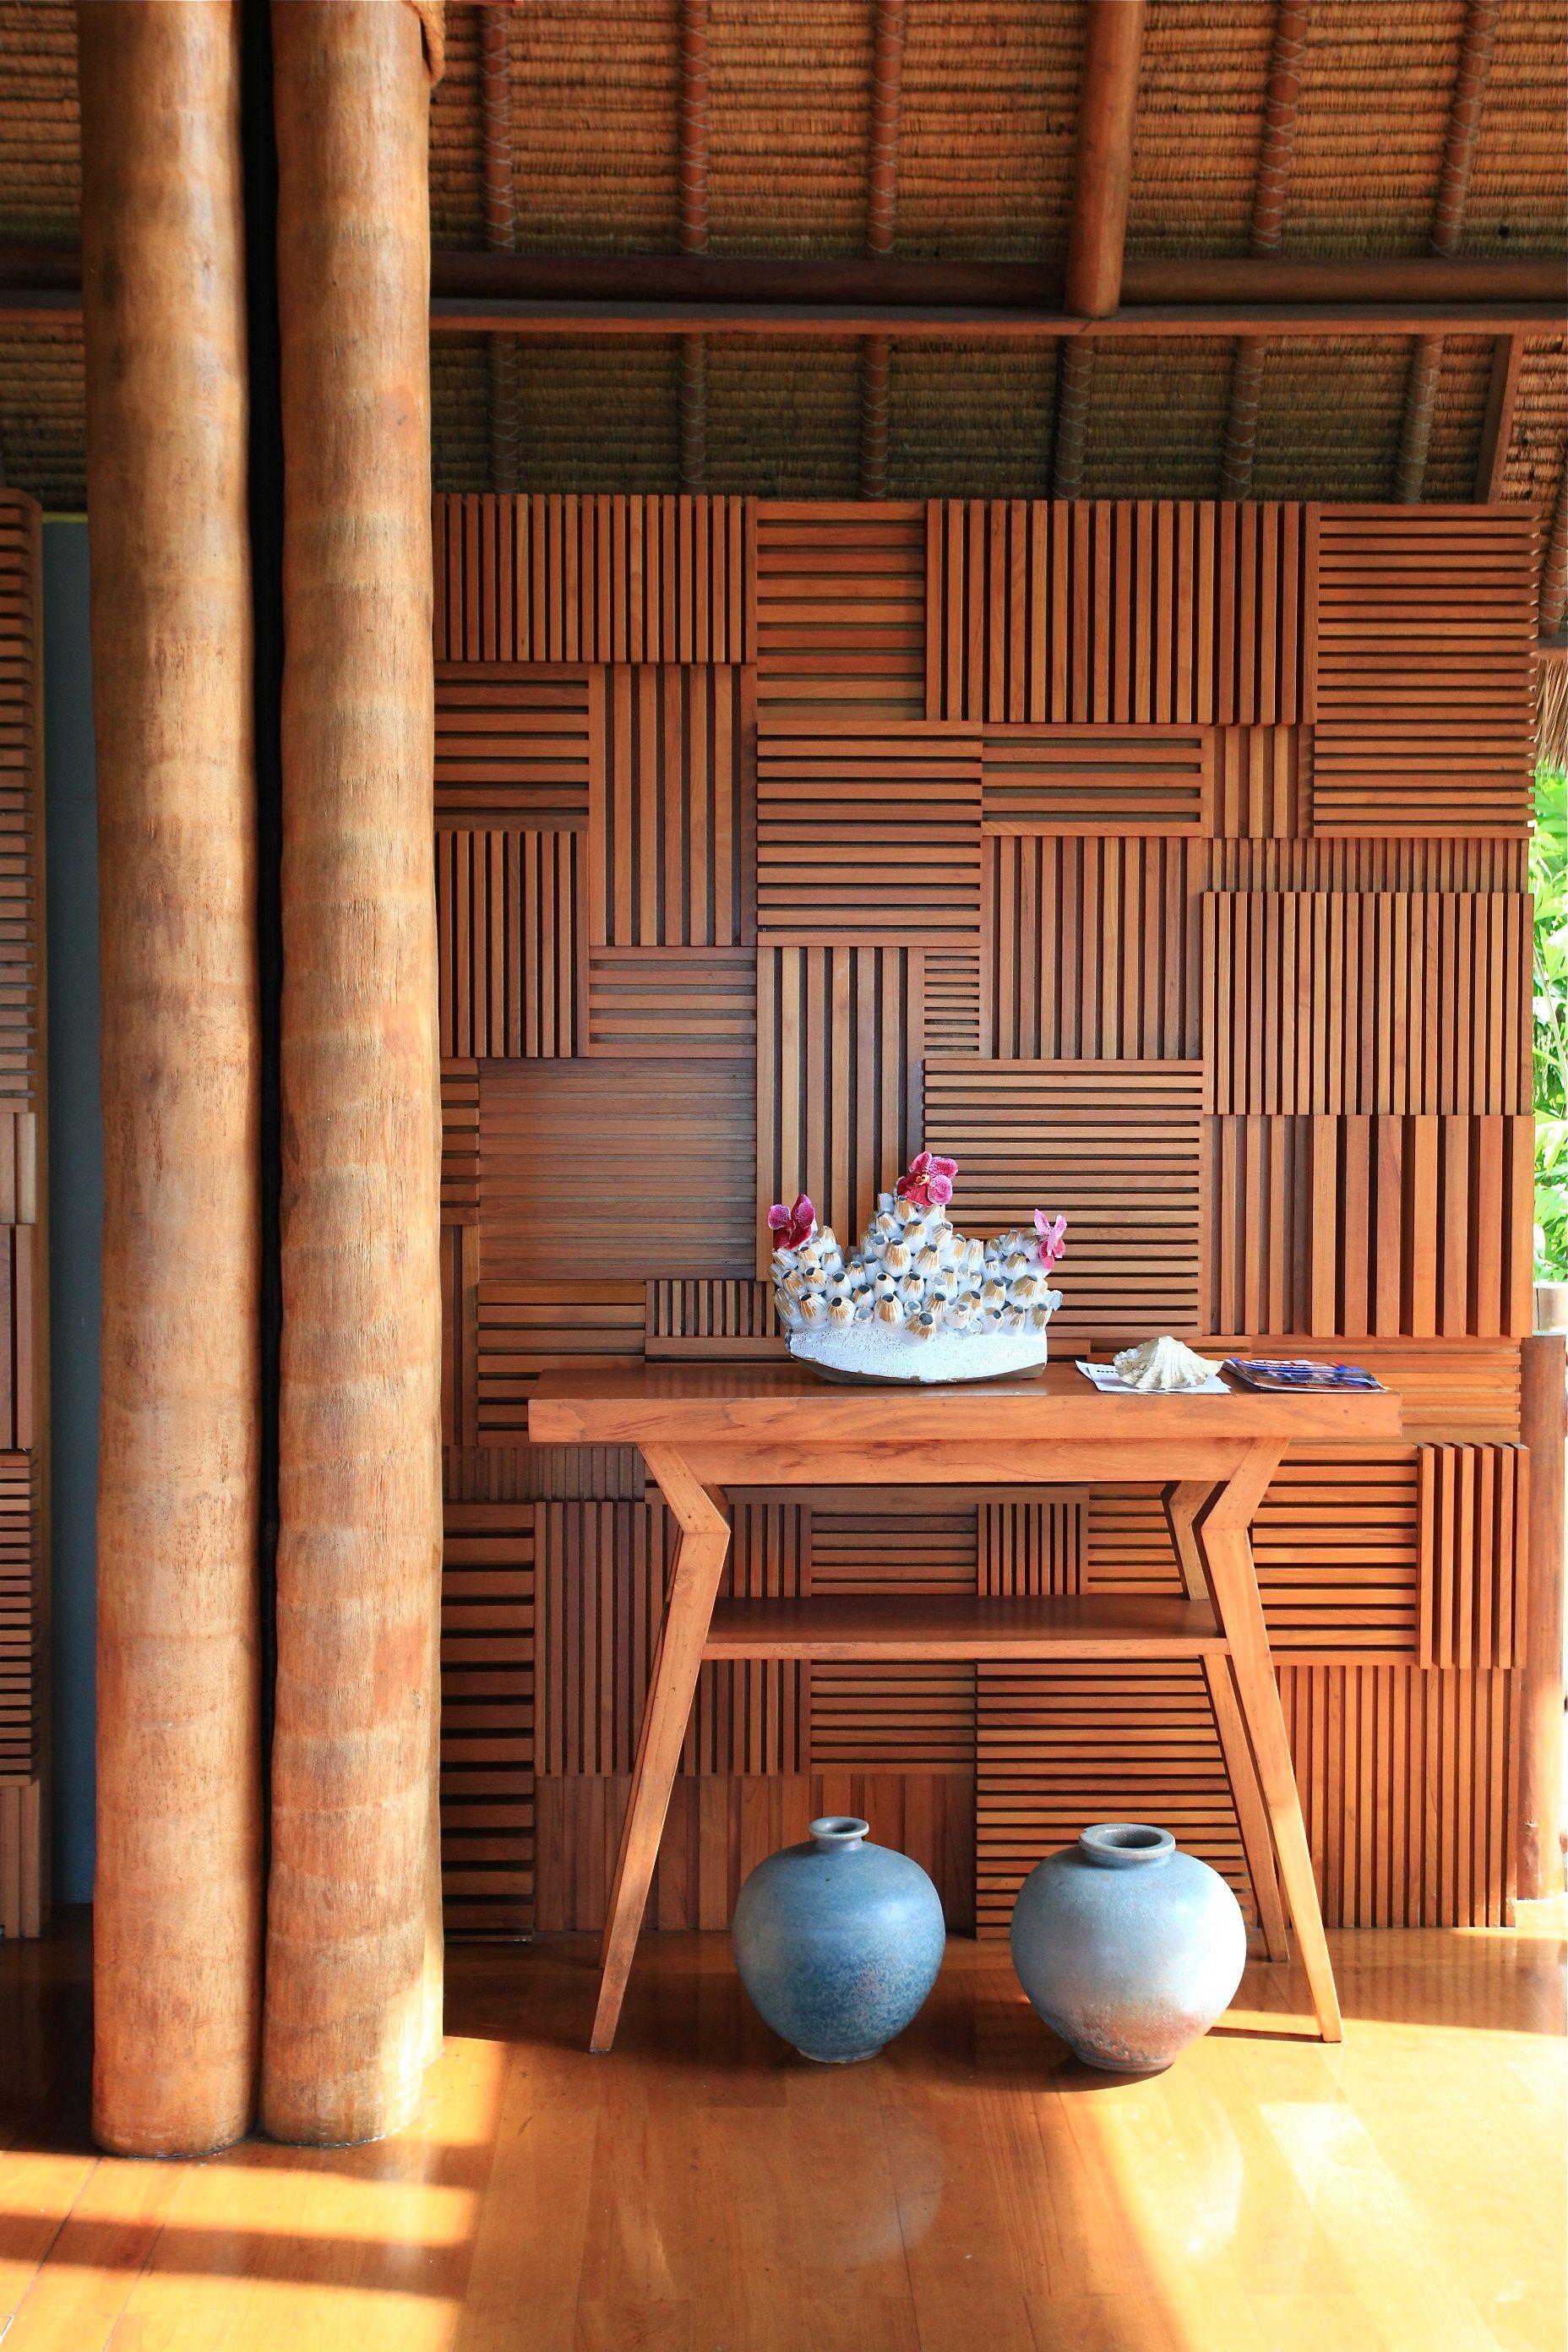 Four seasons resort koh samui thailand designed by bensley